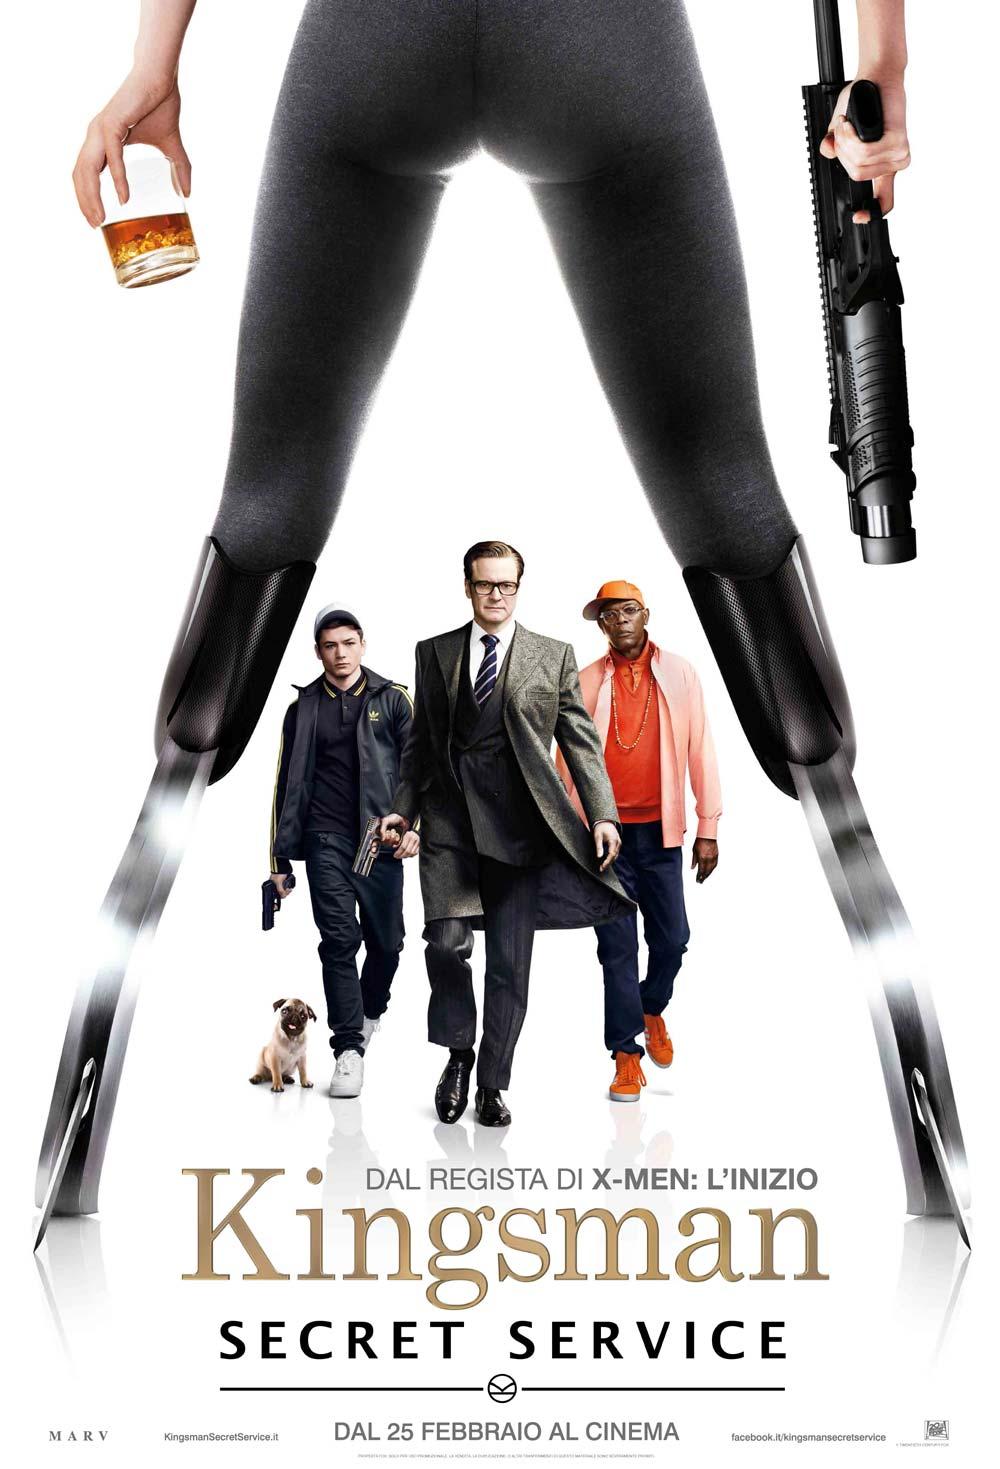 Kingsman The Secret Service คิงส์แมน โคตรพิทักษ์บ่มพยัคฆ์ [HD][พากย์ไทย]